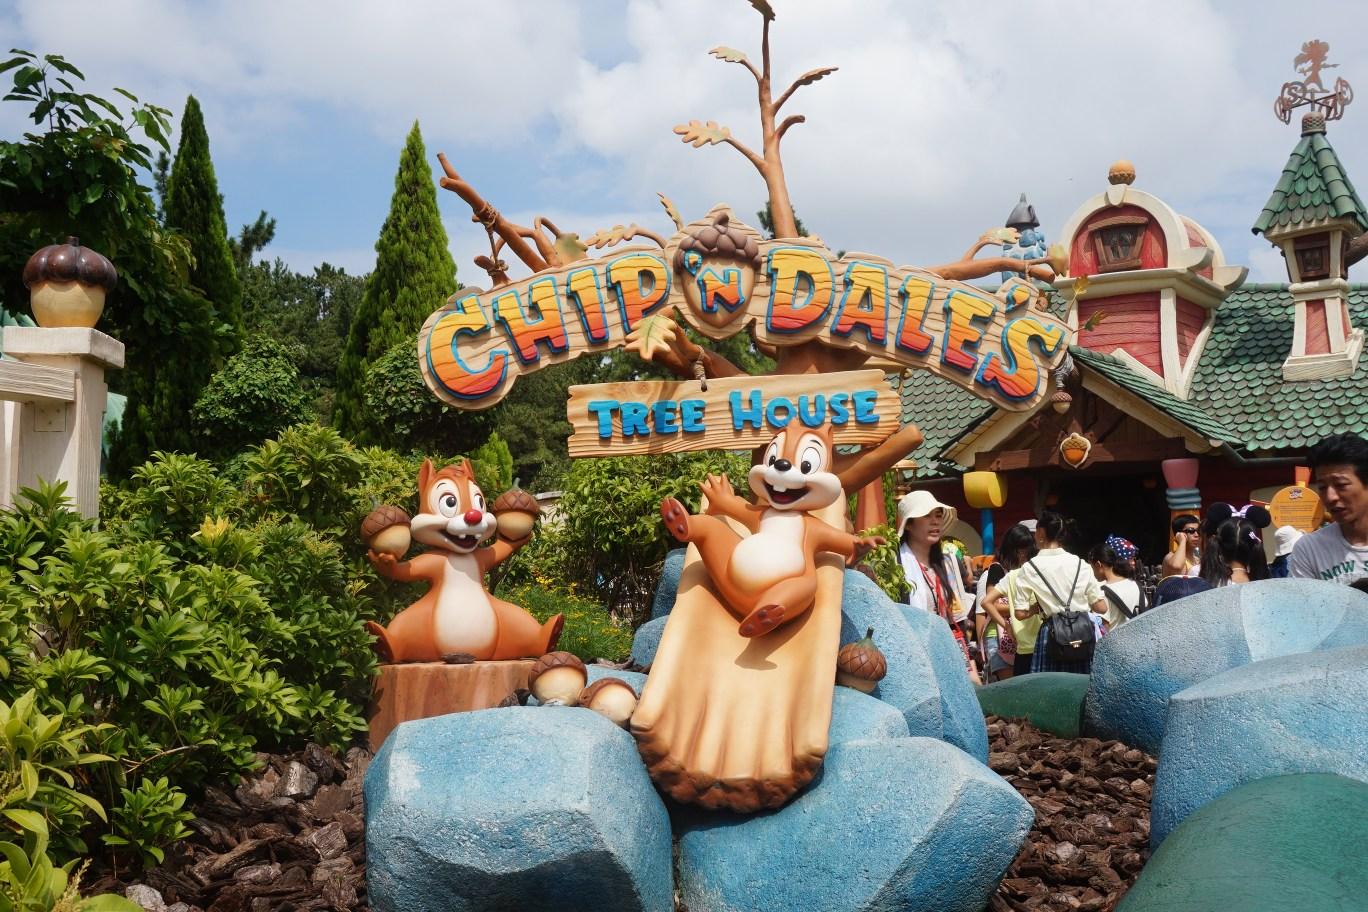 One day Tokyo Disneyland